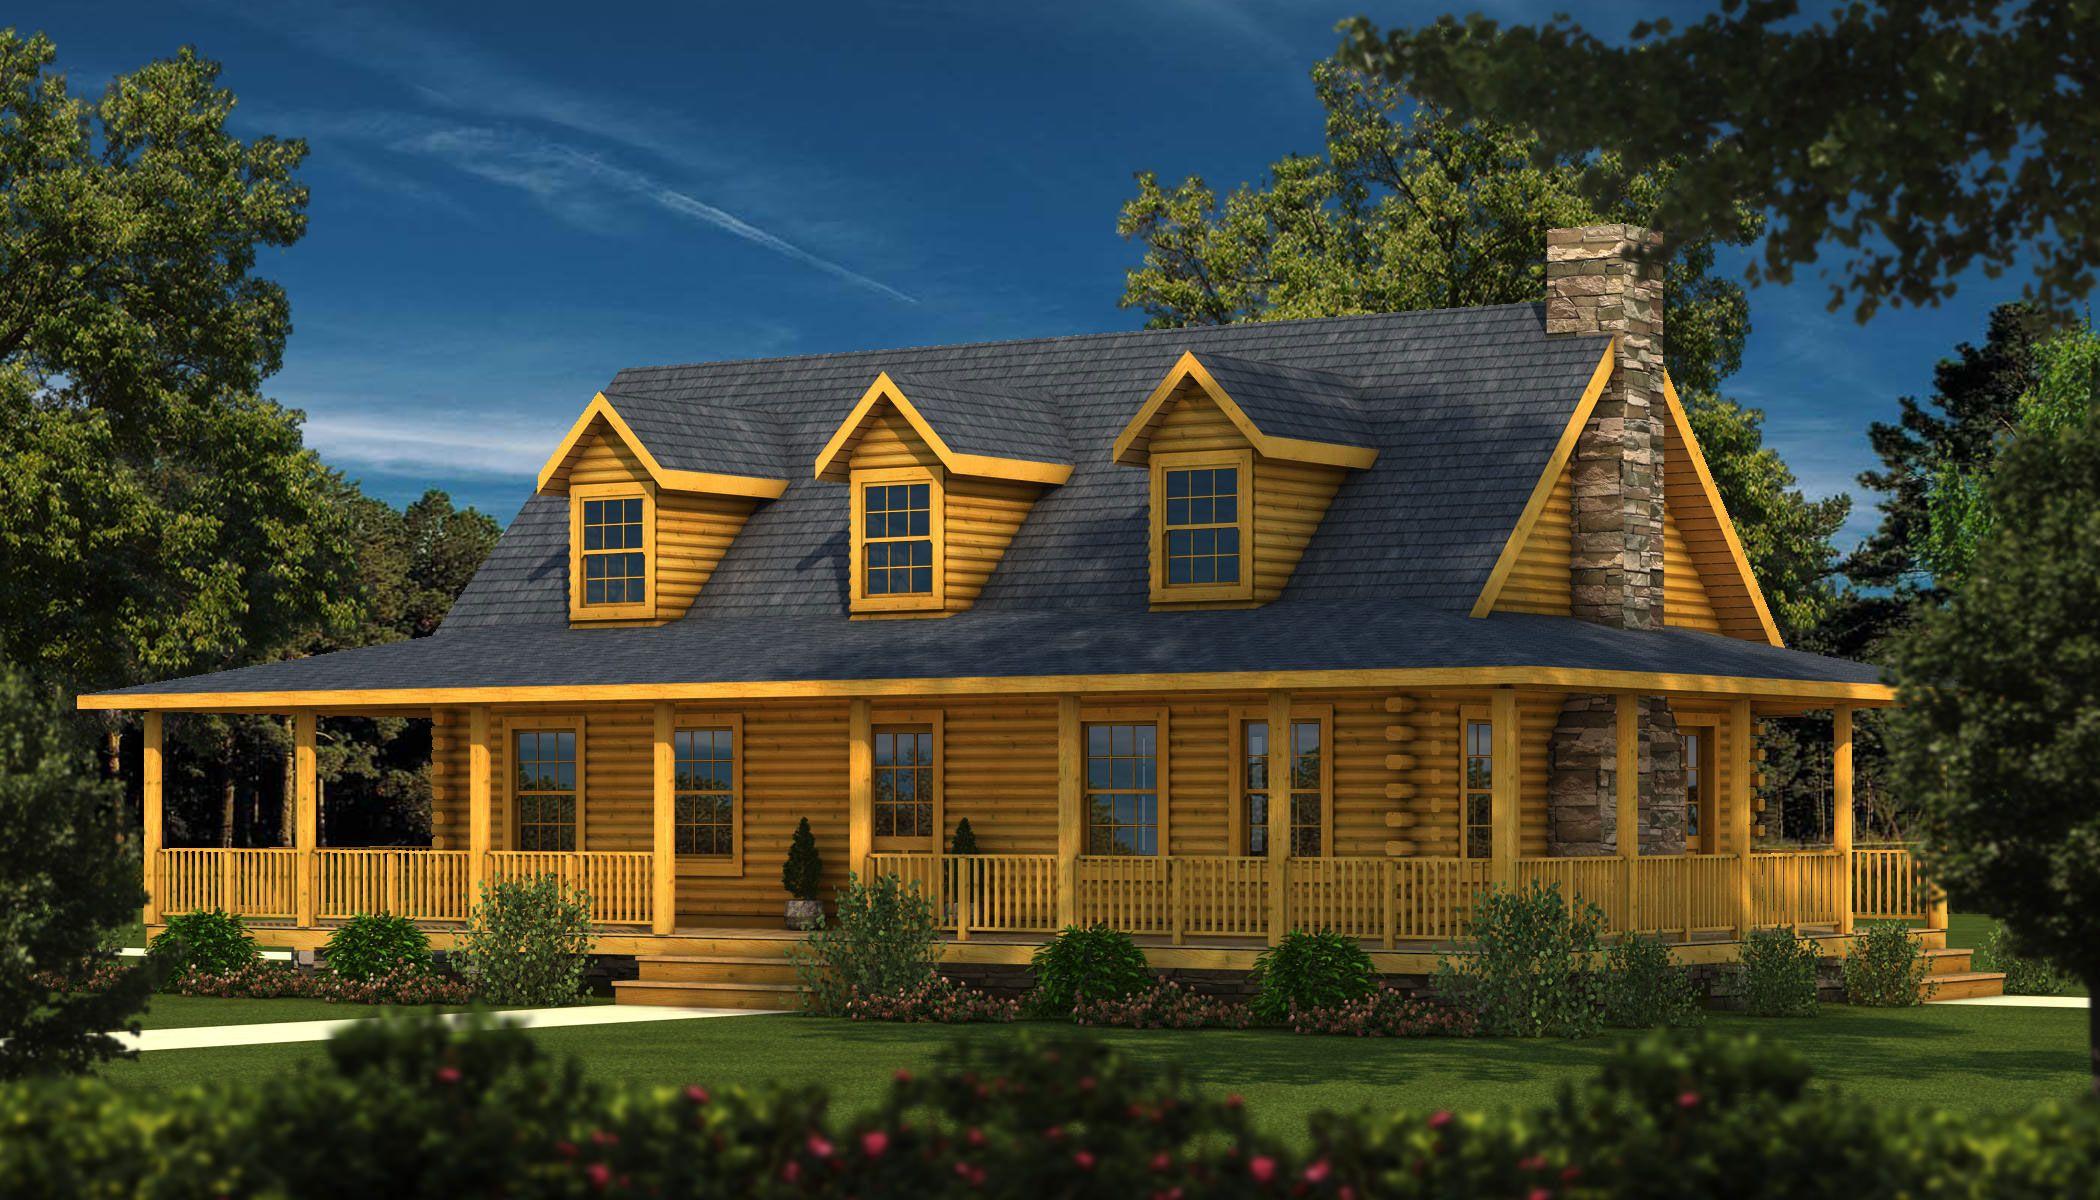 charleston ii - log home plan | southland log homes https://www